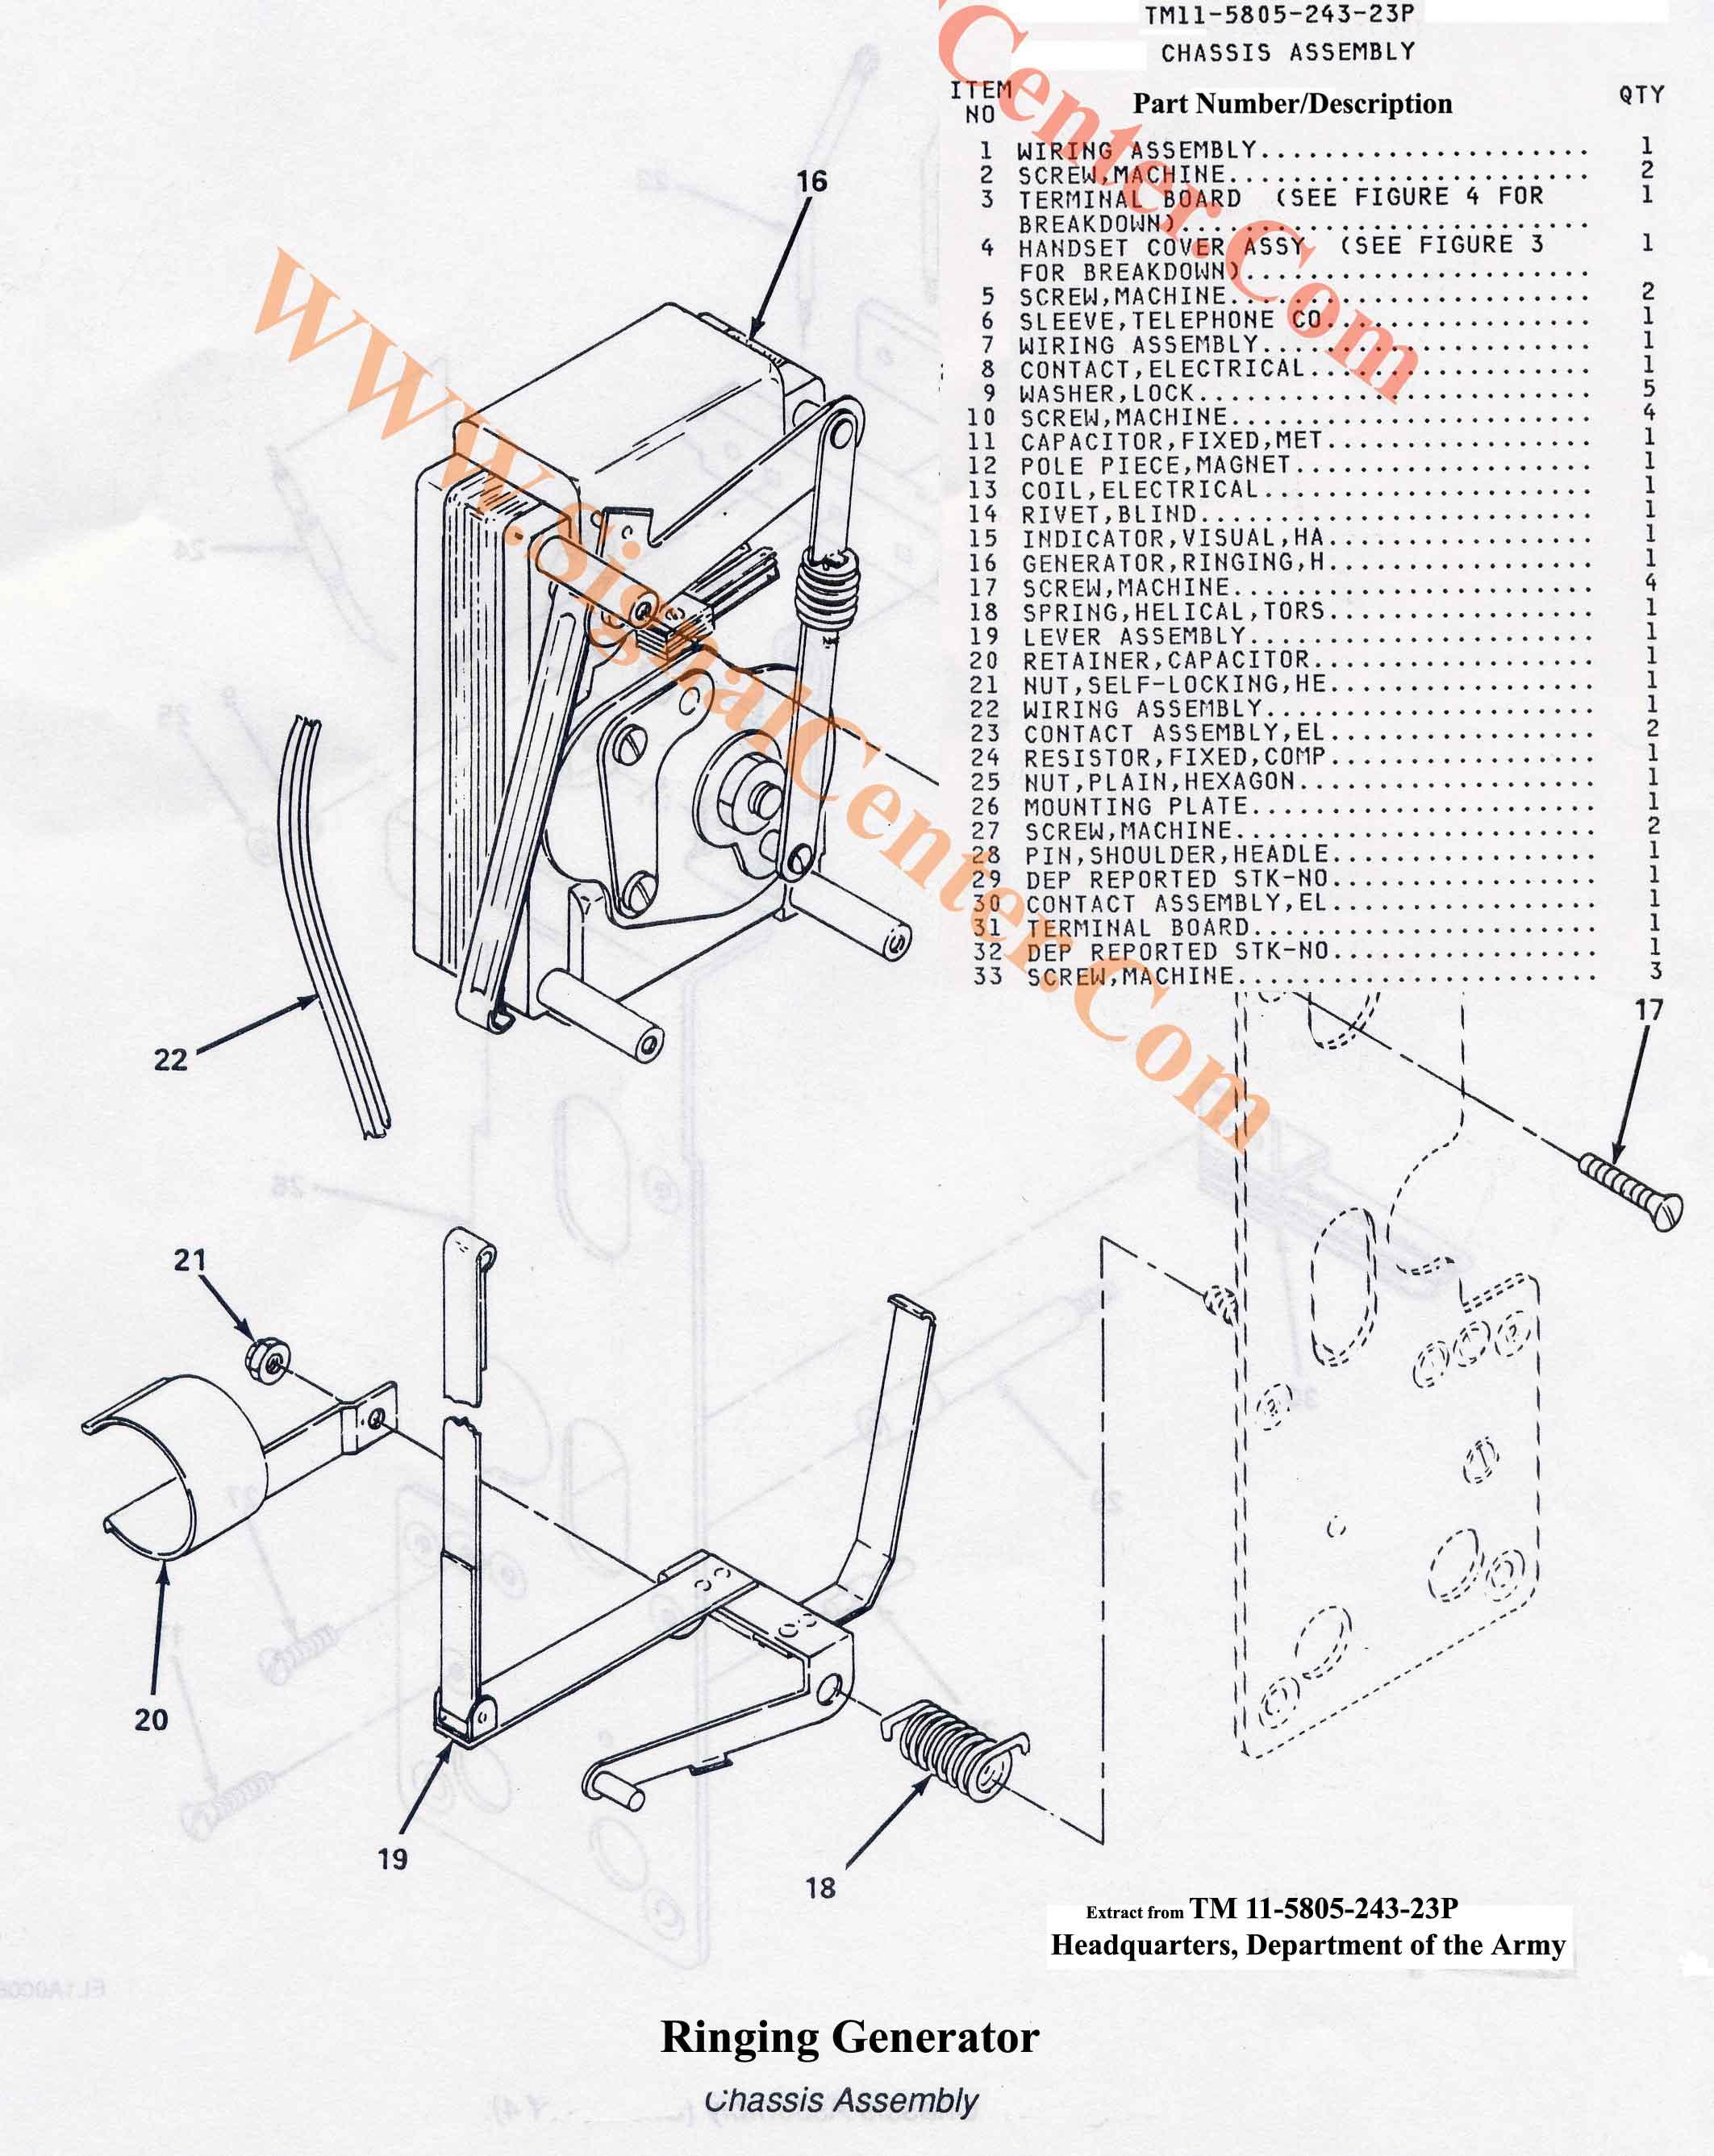 TA-1/PT Ringing Generator Assembly